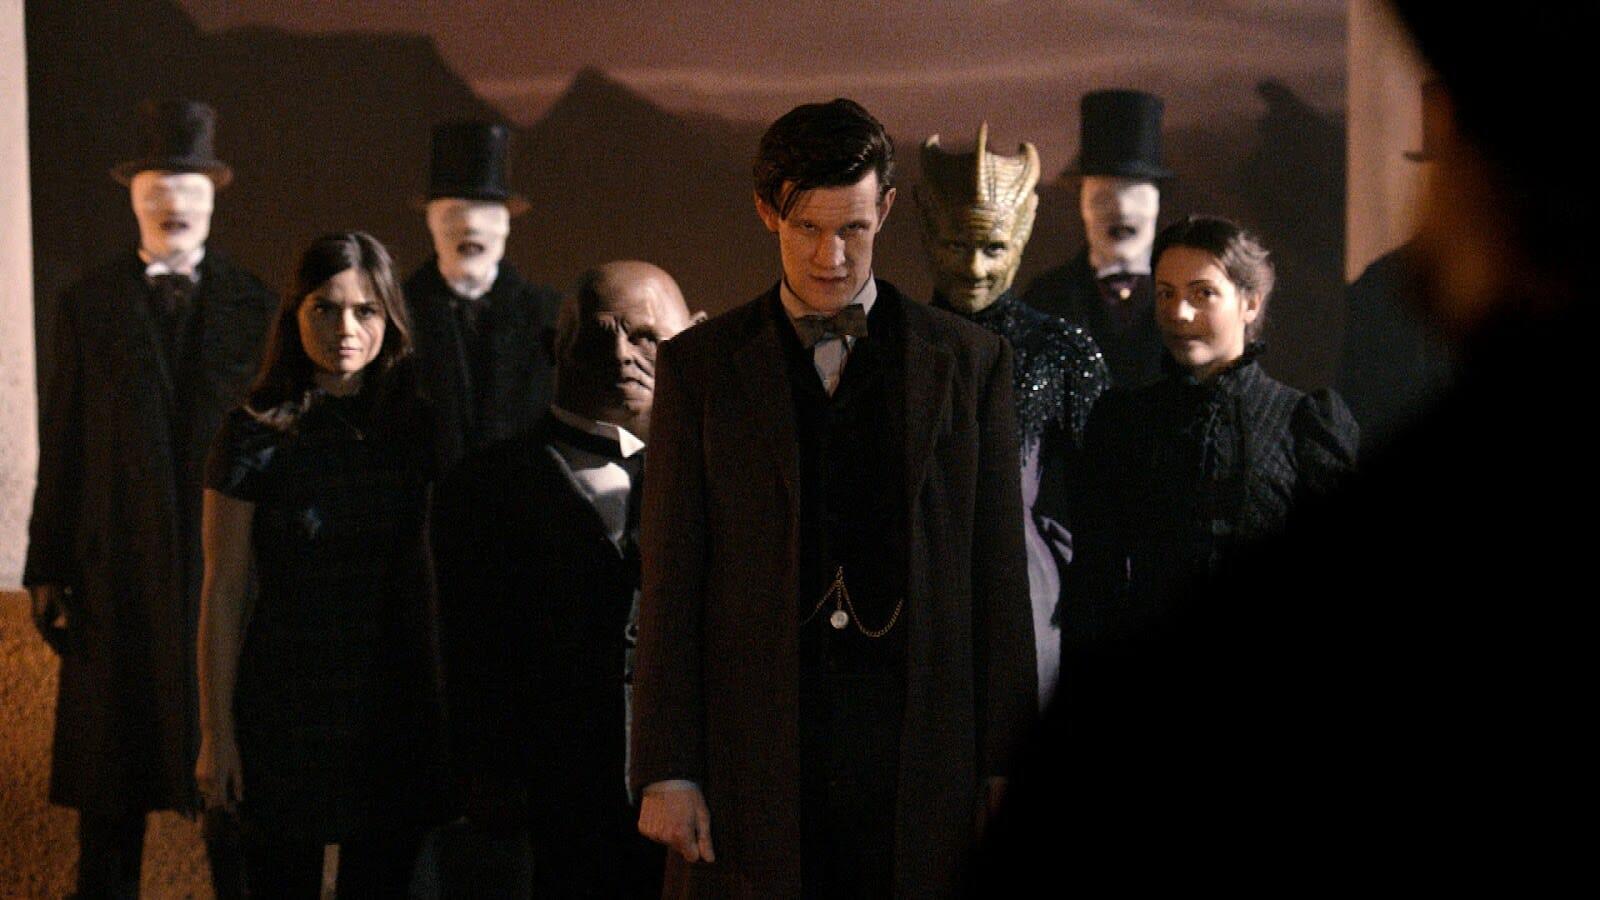 4198577-high-doctor-who-series-7b